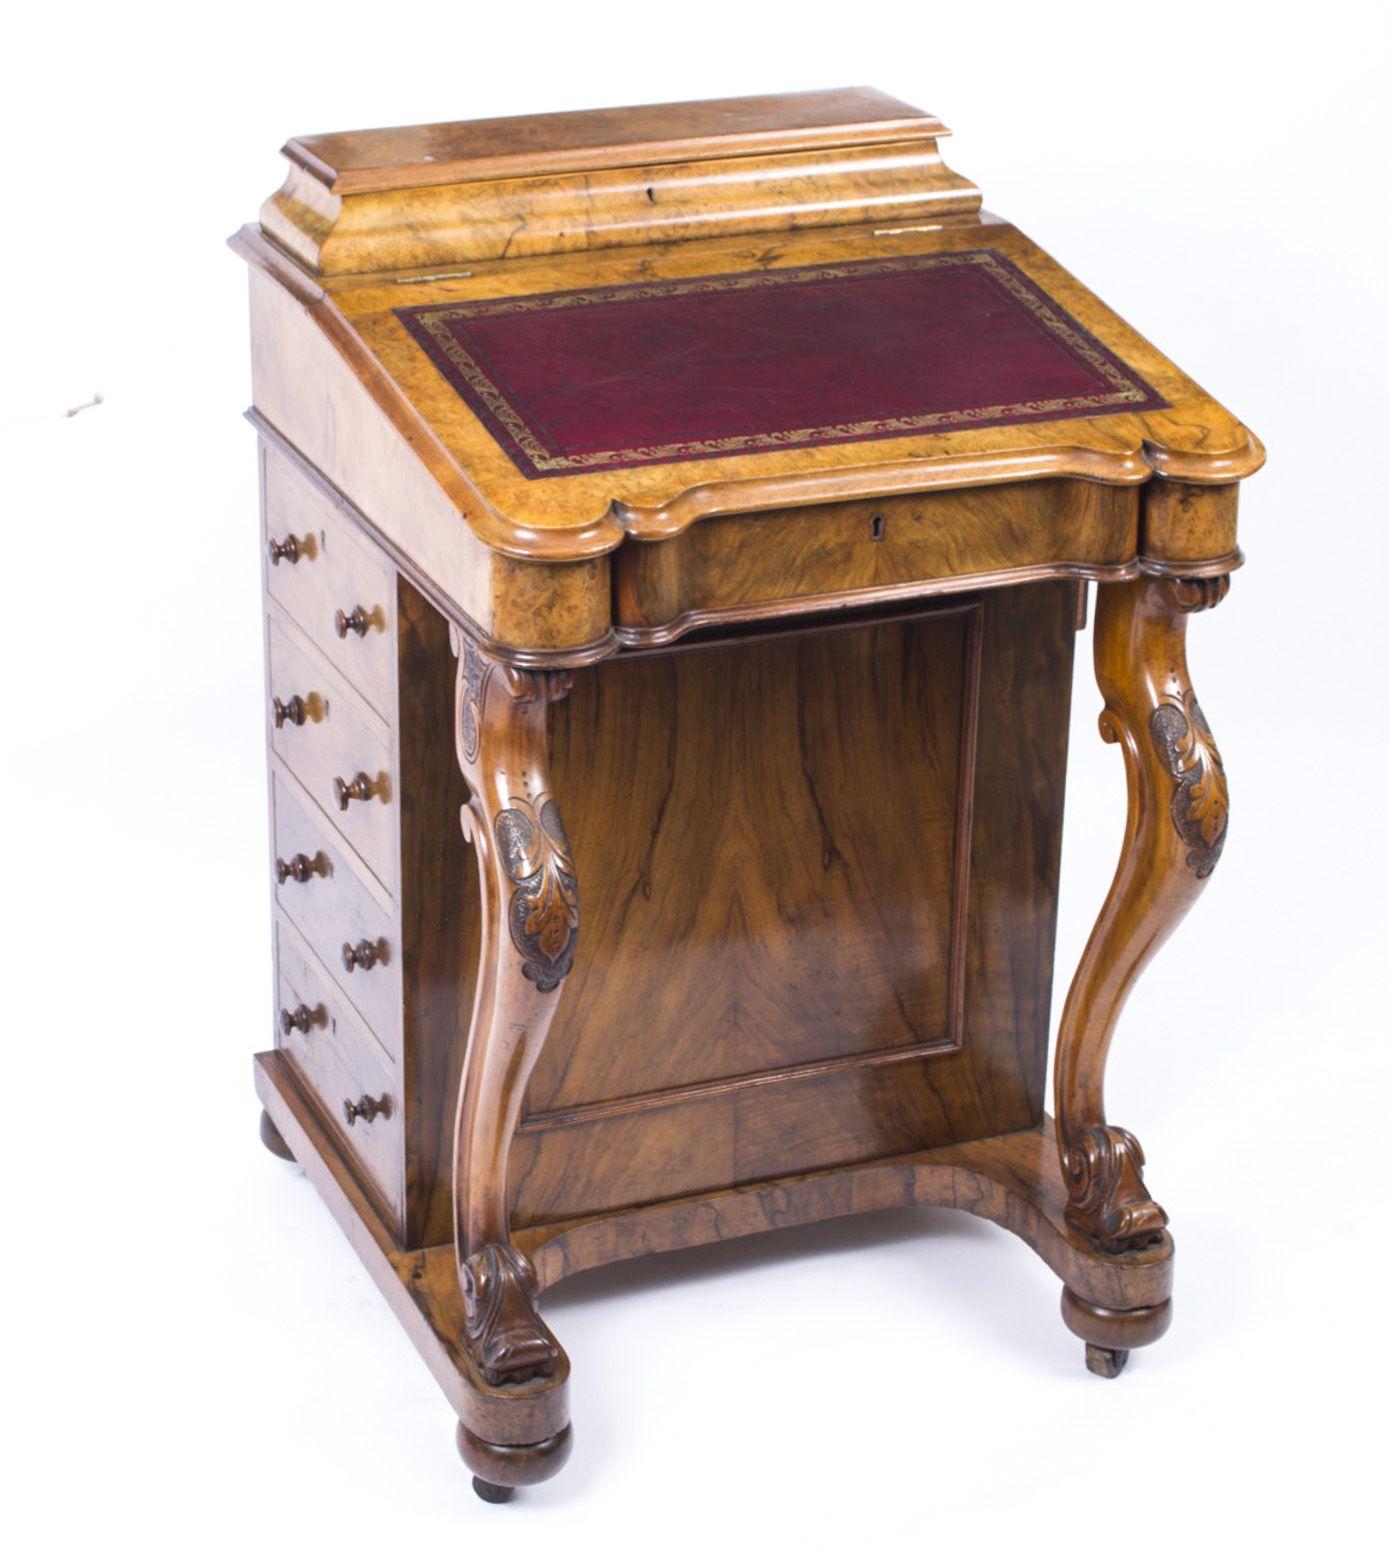 victorian office furniture. A Magnificent Antique Victorian Burr Walnut Davenport Desk, Circa 1870. Office Furniture